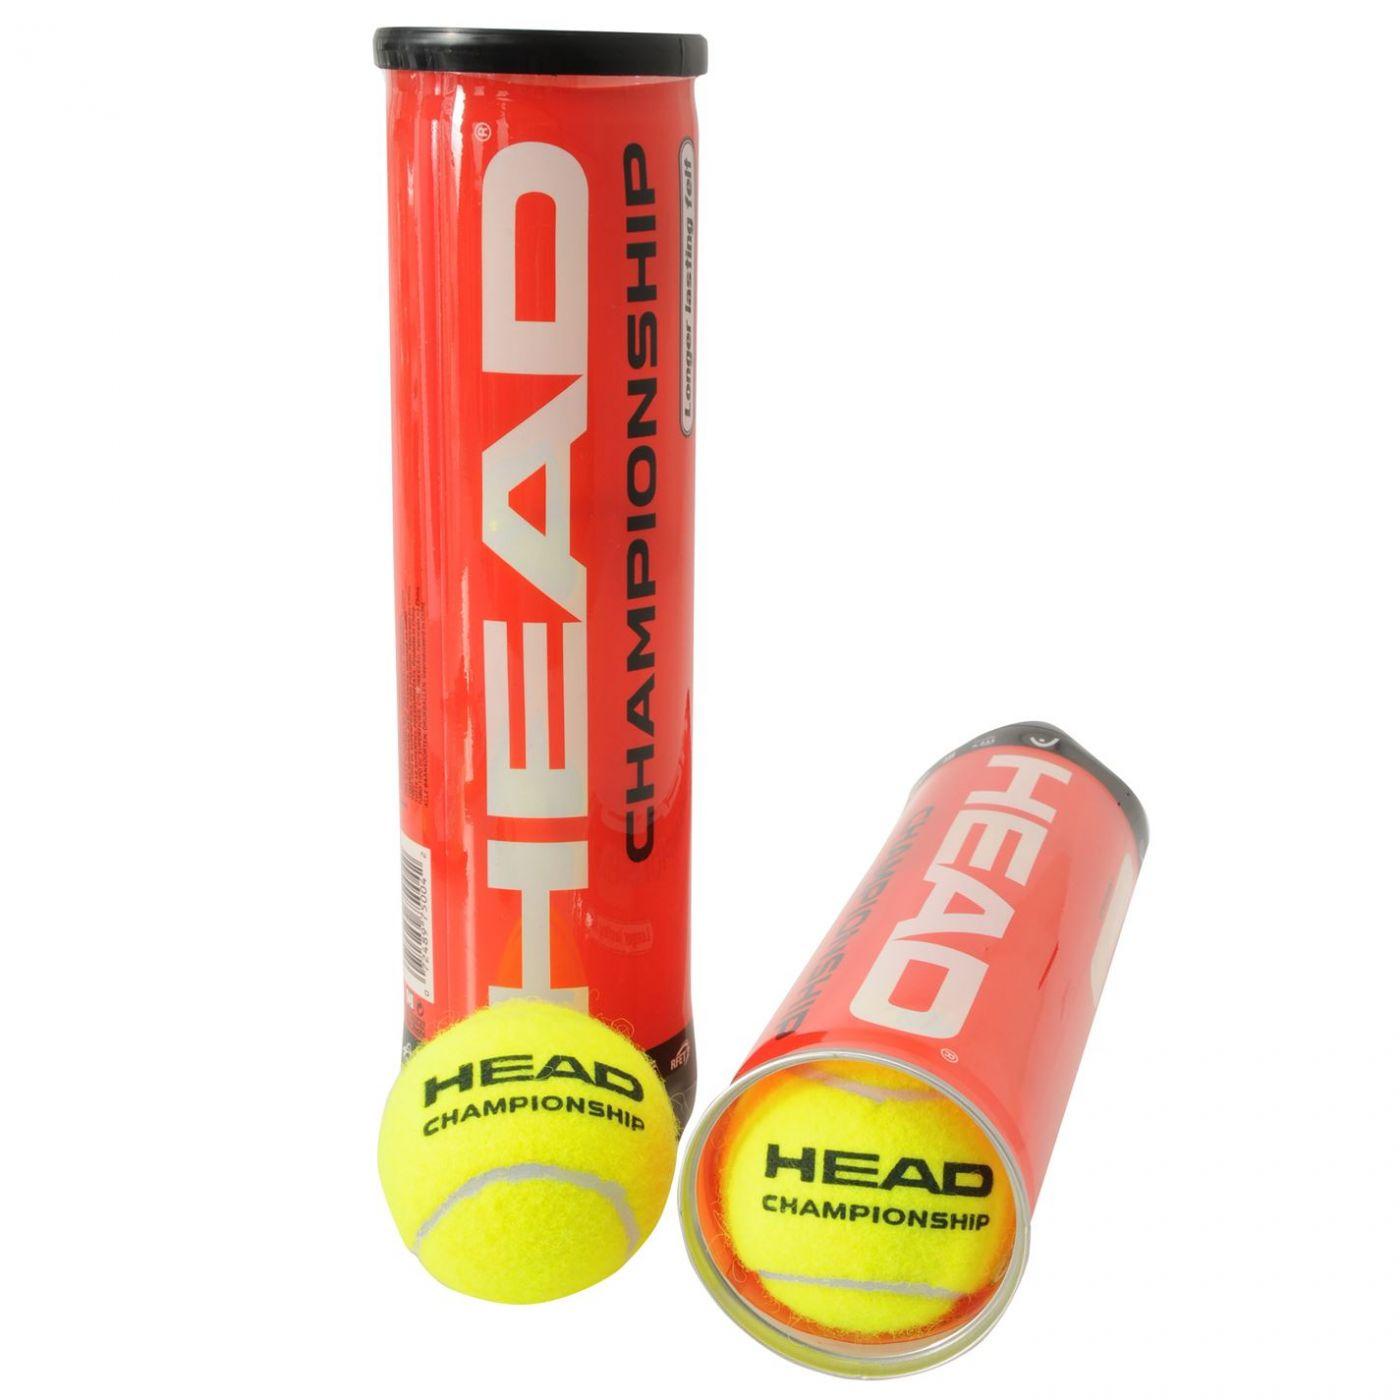 Head Championship Murray Tennis Balls